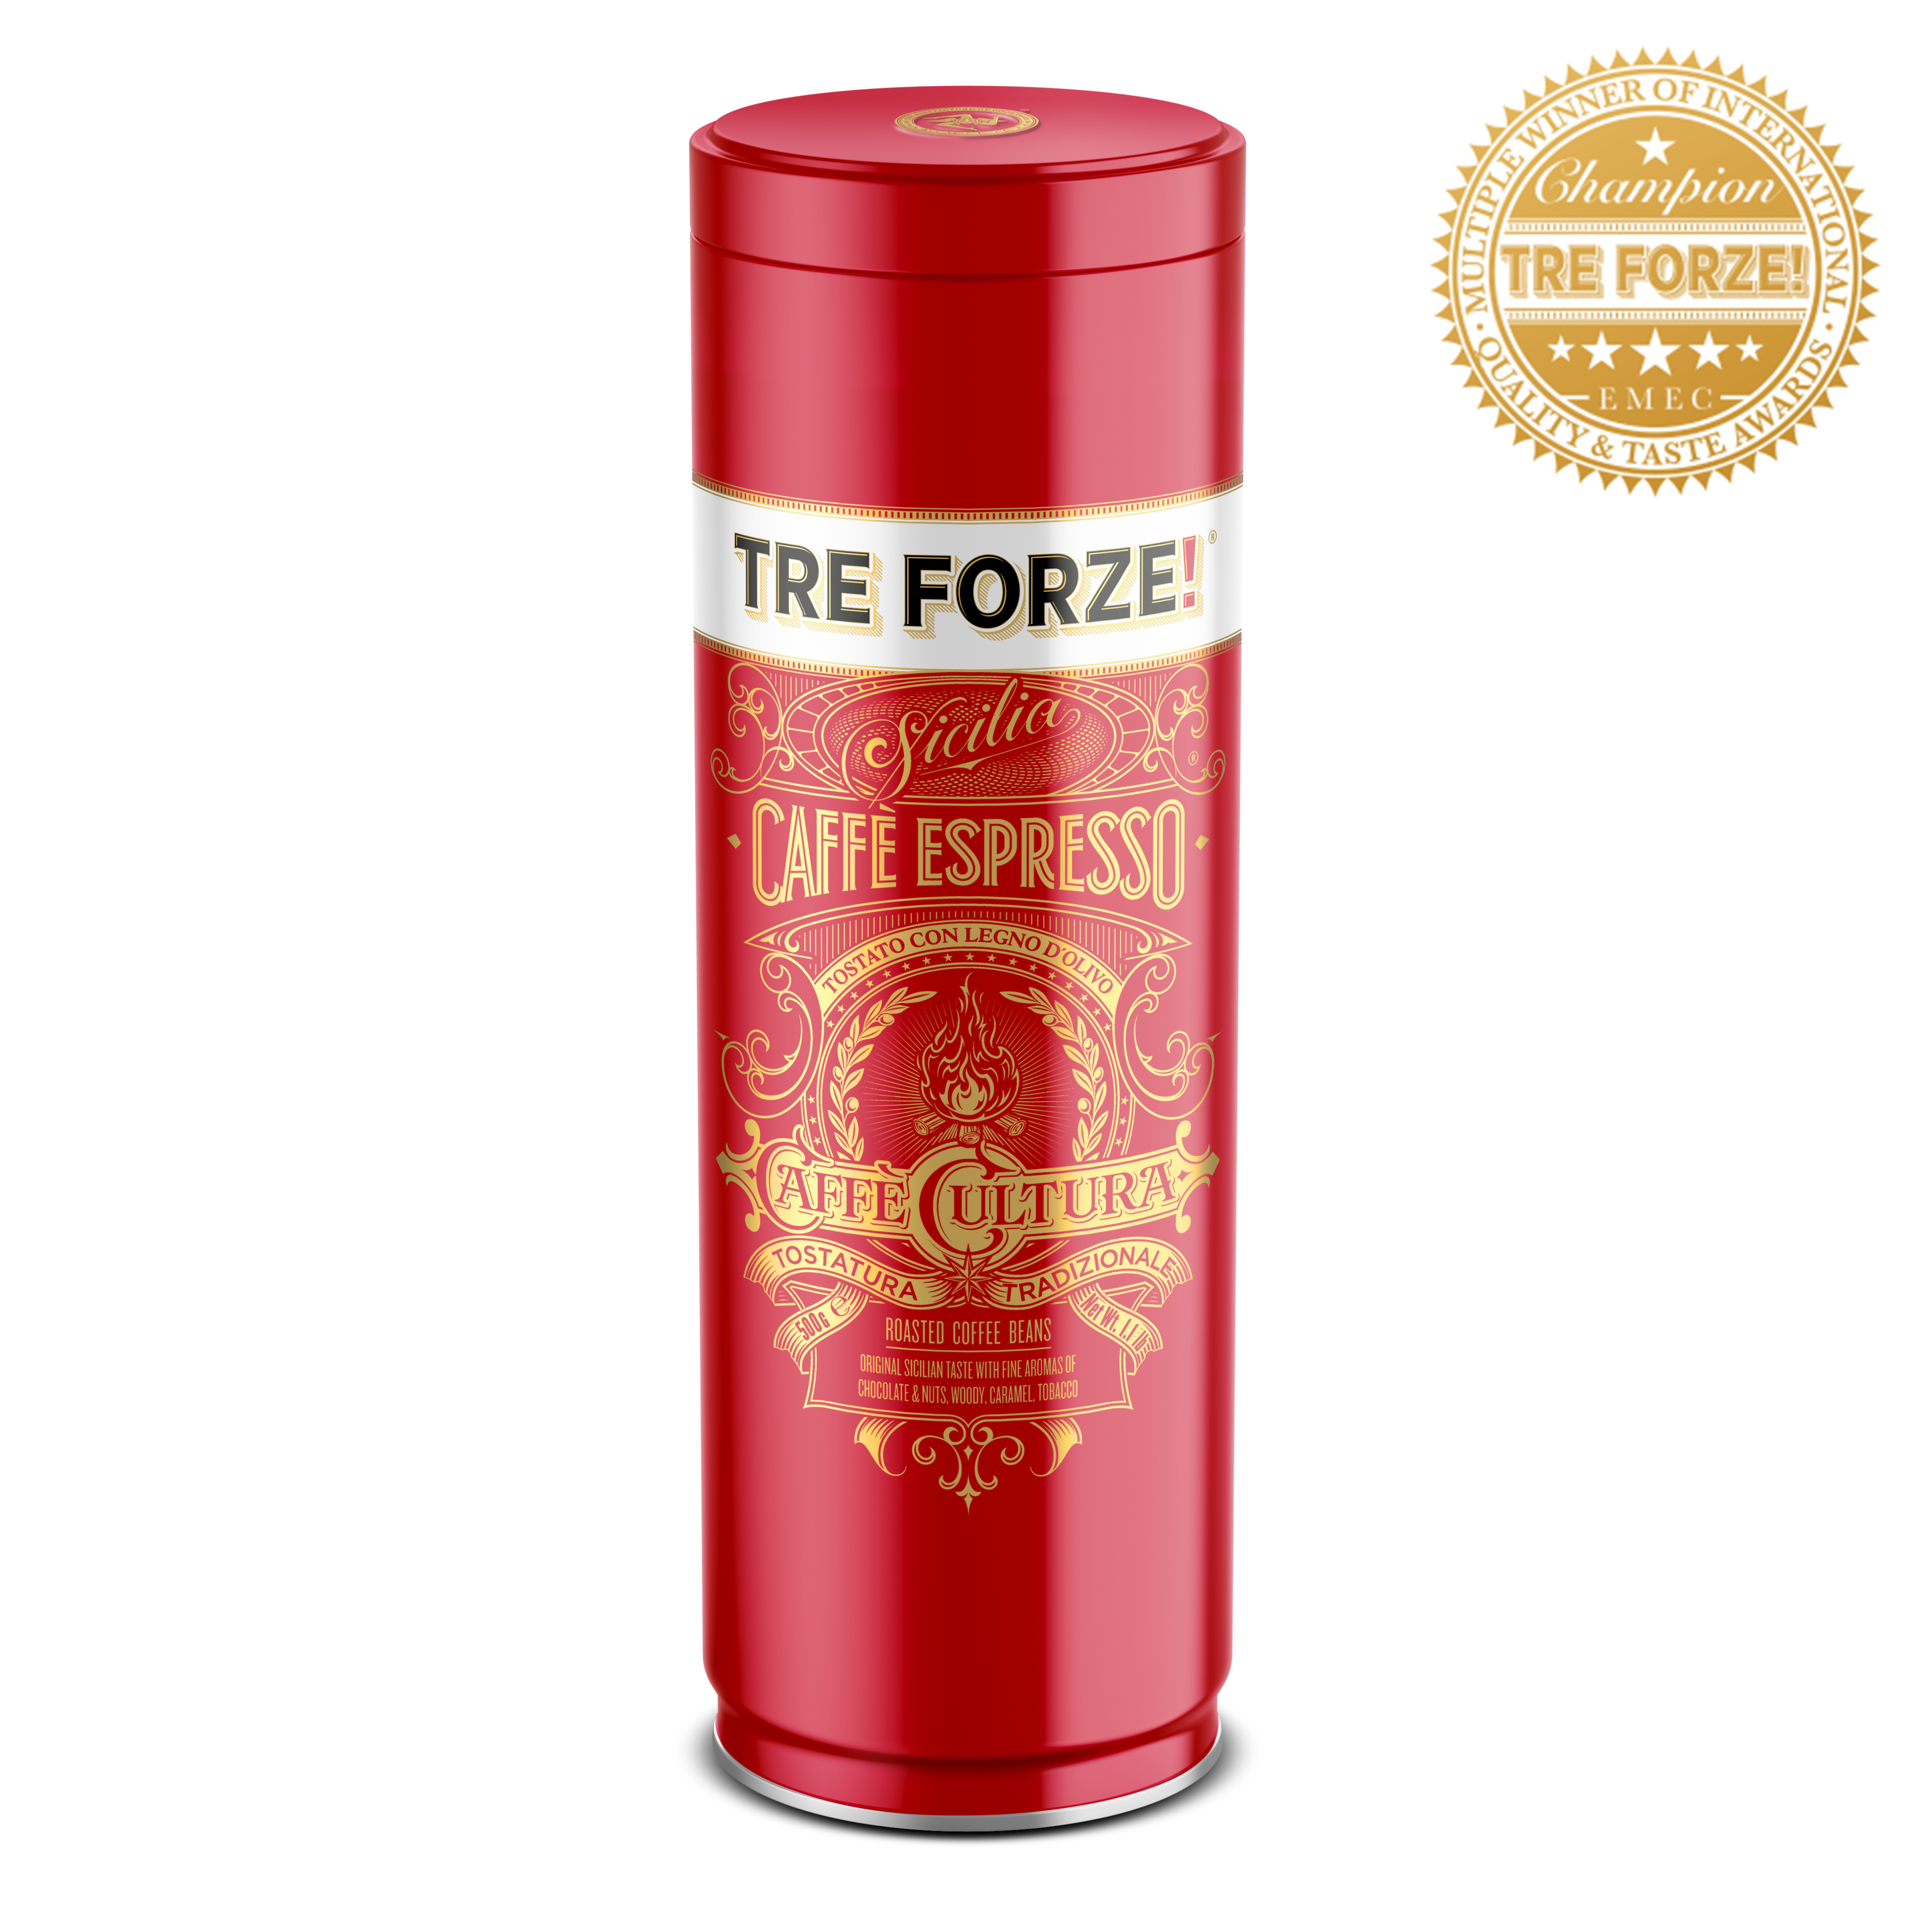 TRE FORZE! - Caffè Espresso - 500g Bohnen